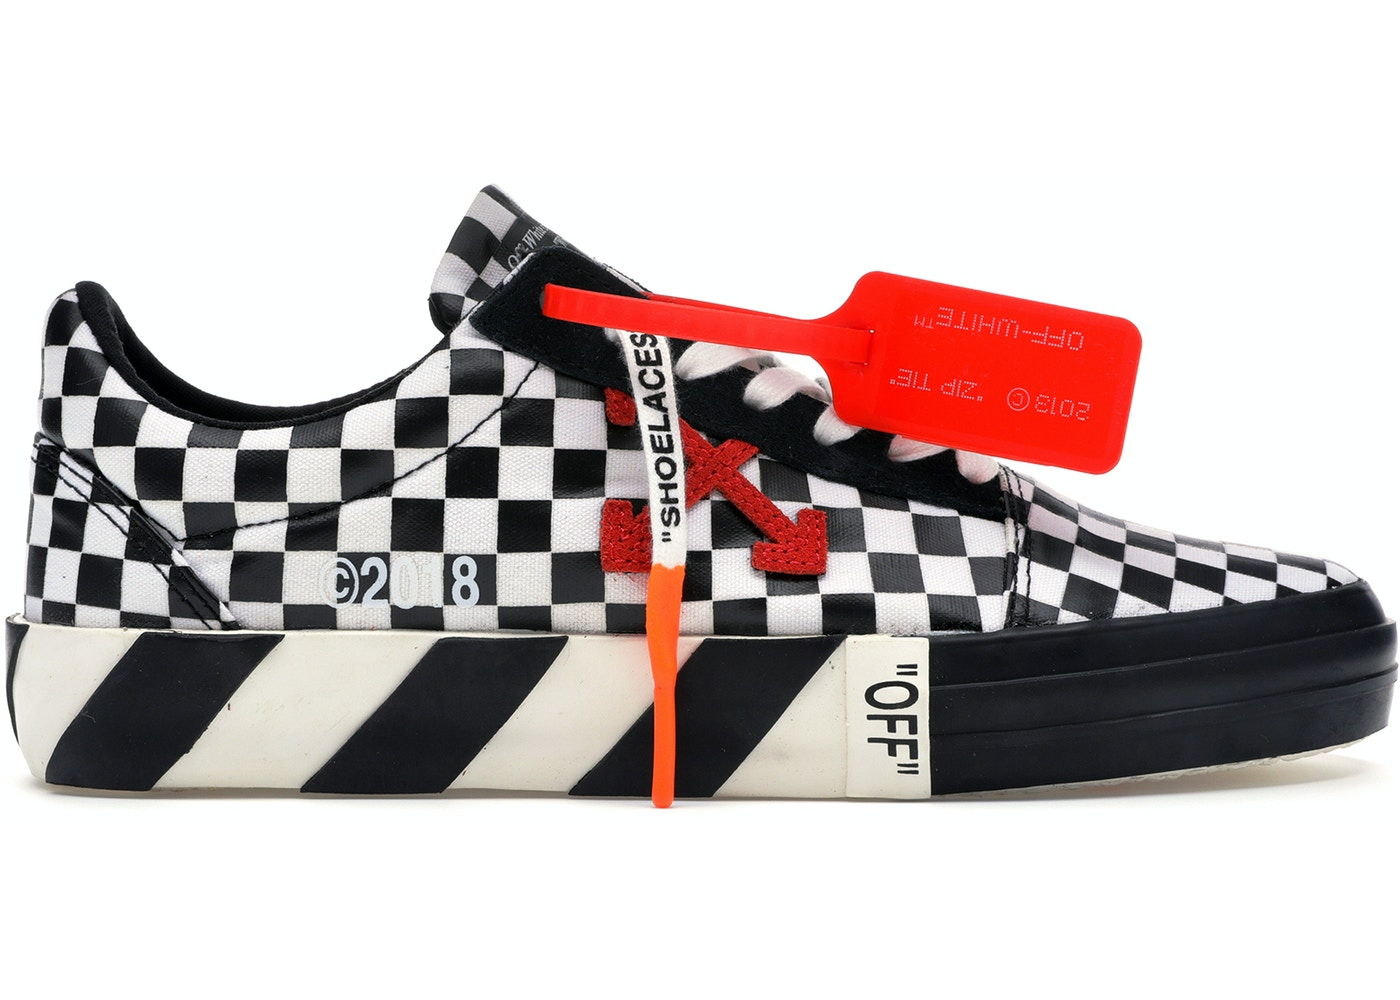 31ffdc0e071 Off-White Vulc Low Checkered Black White - OMIA085E18351001 9900